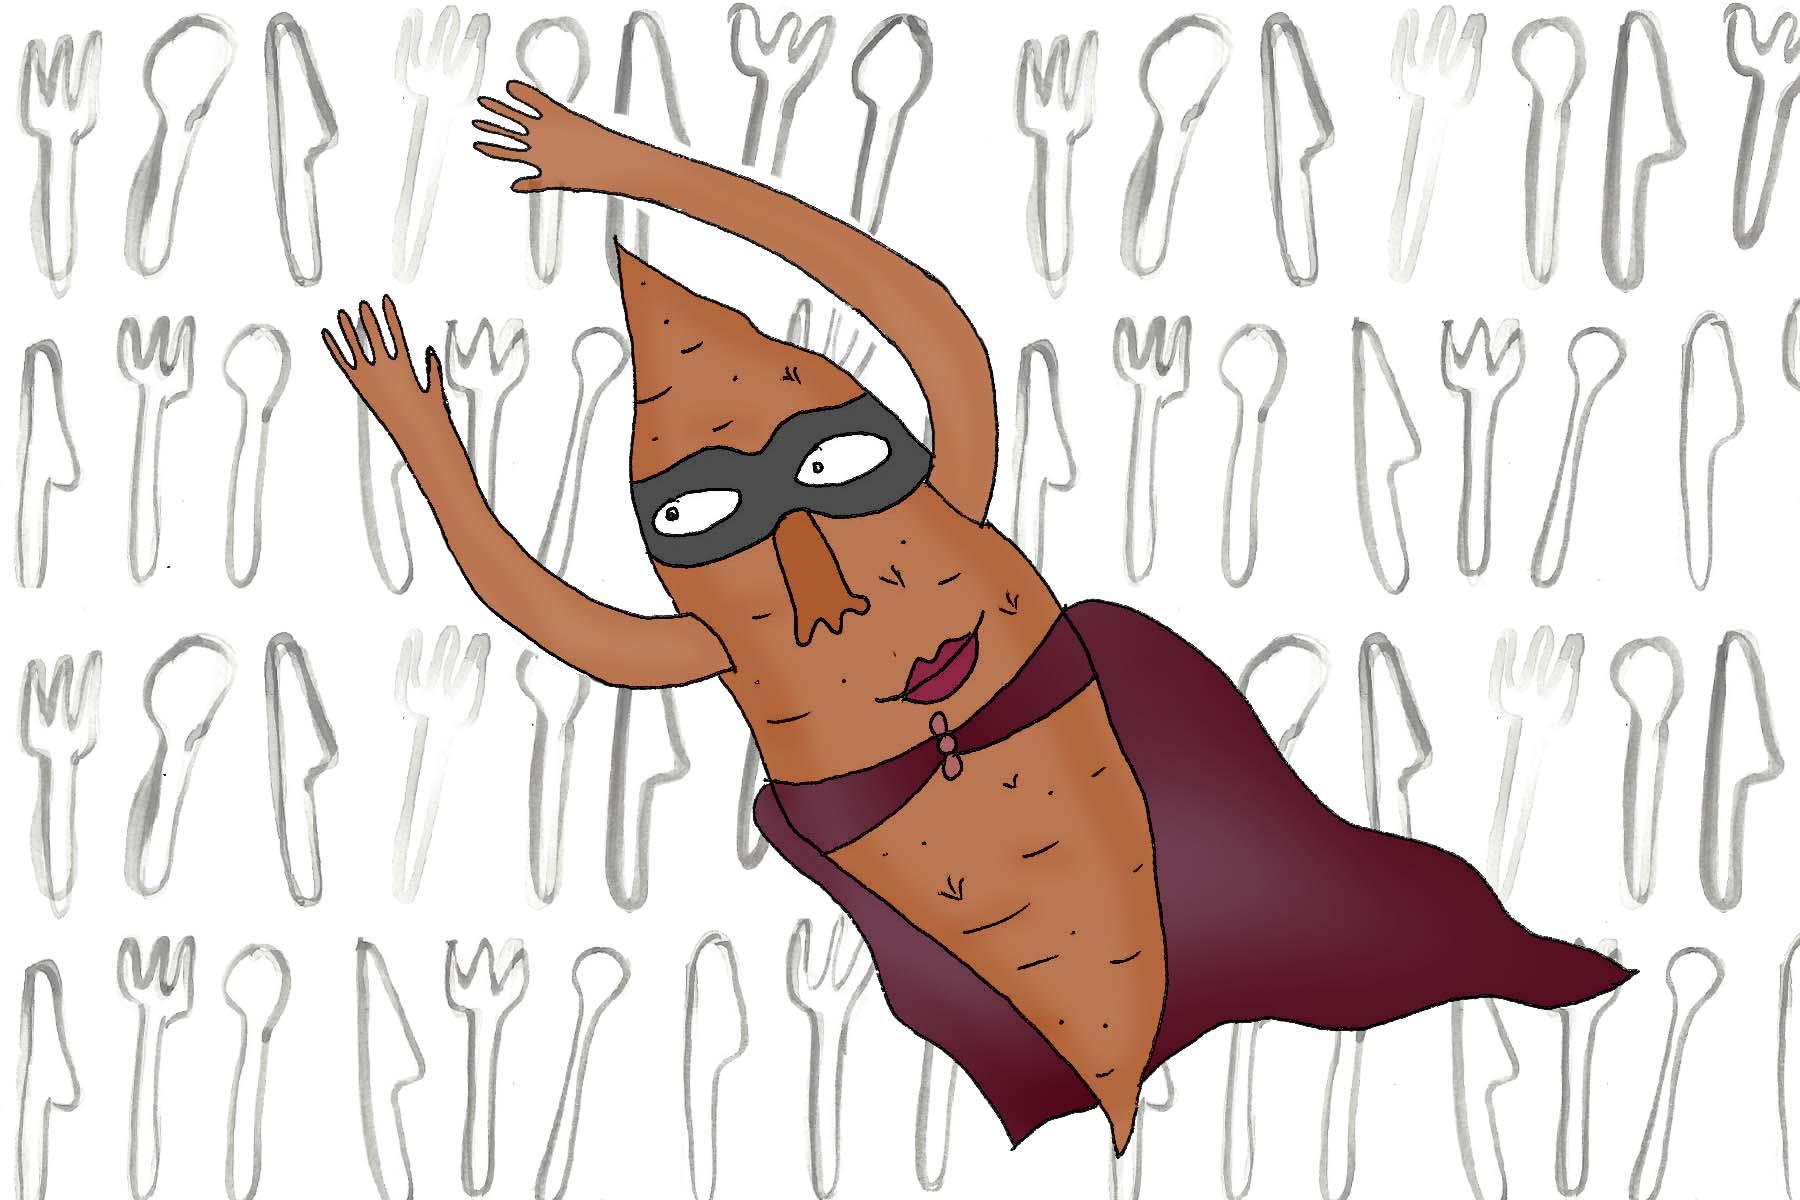 Sweet potato, the super tuber